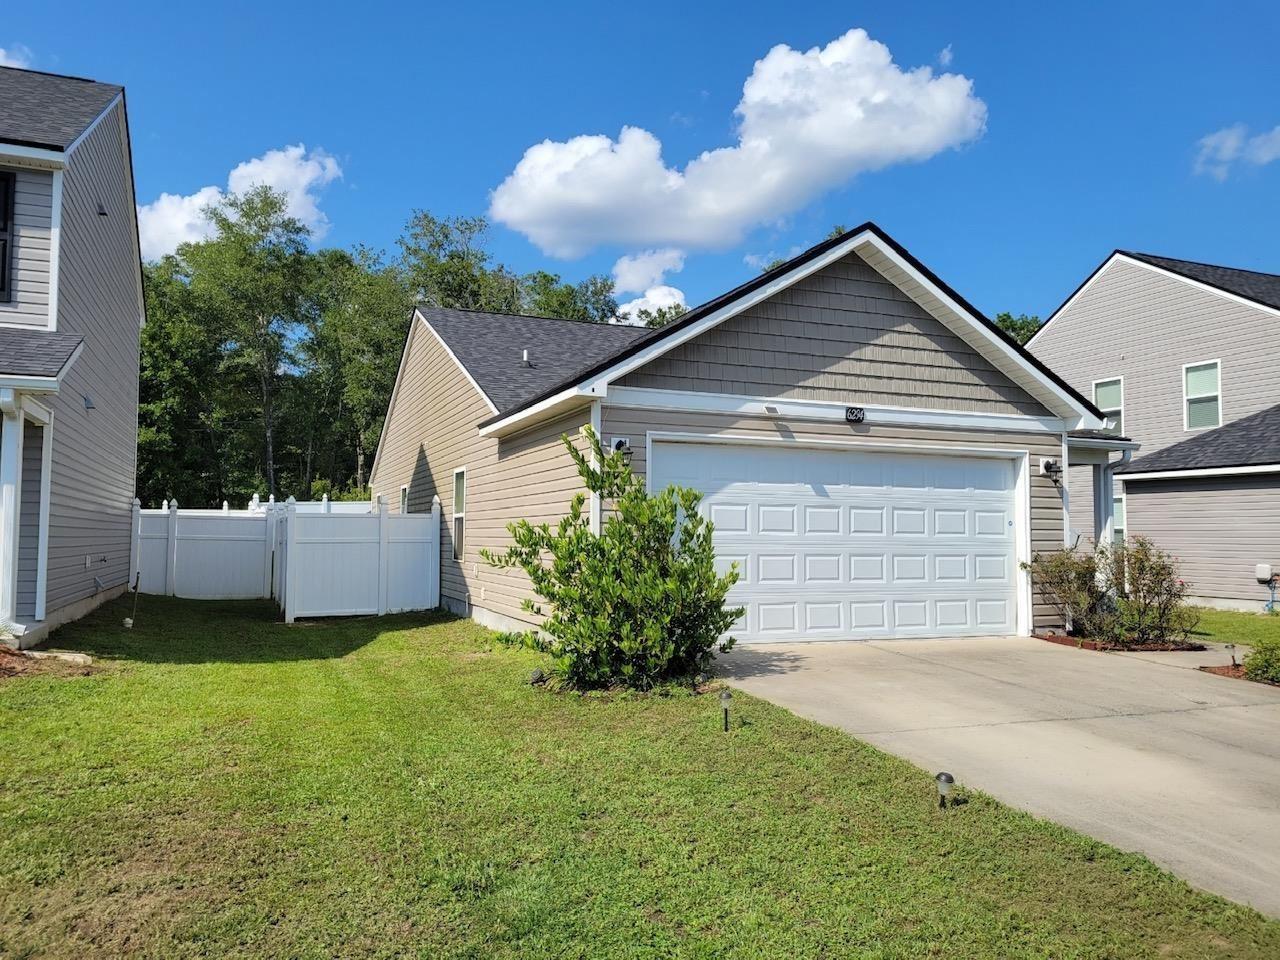 Photo of 6294 Rivers Landing Court, TALLAHASSEE, FL 32303 (MLS # 338119)